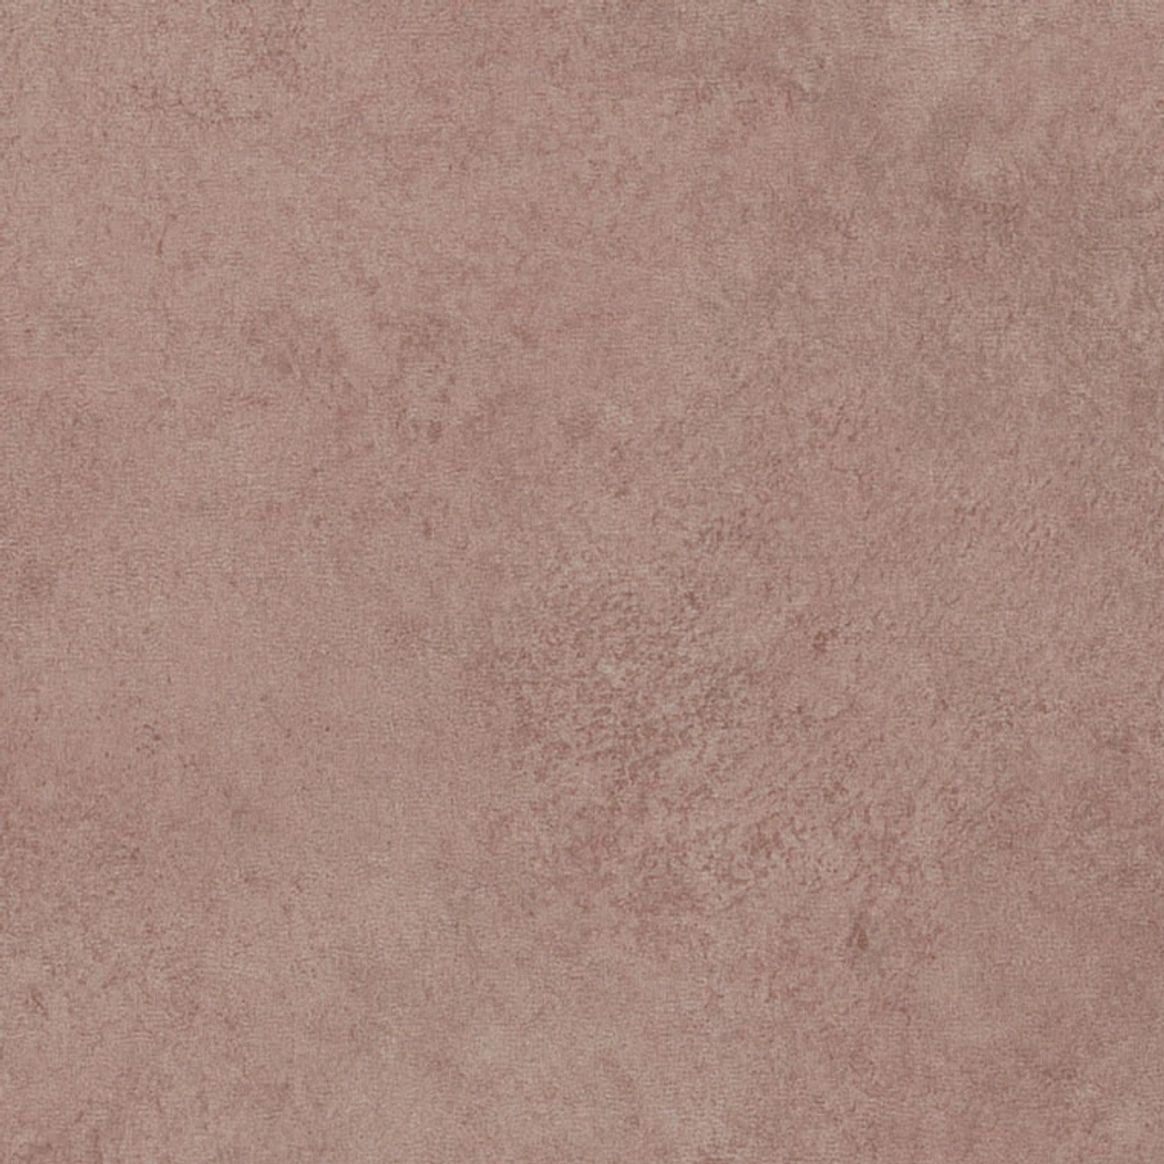 Encaustic Mineral thumbnail